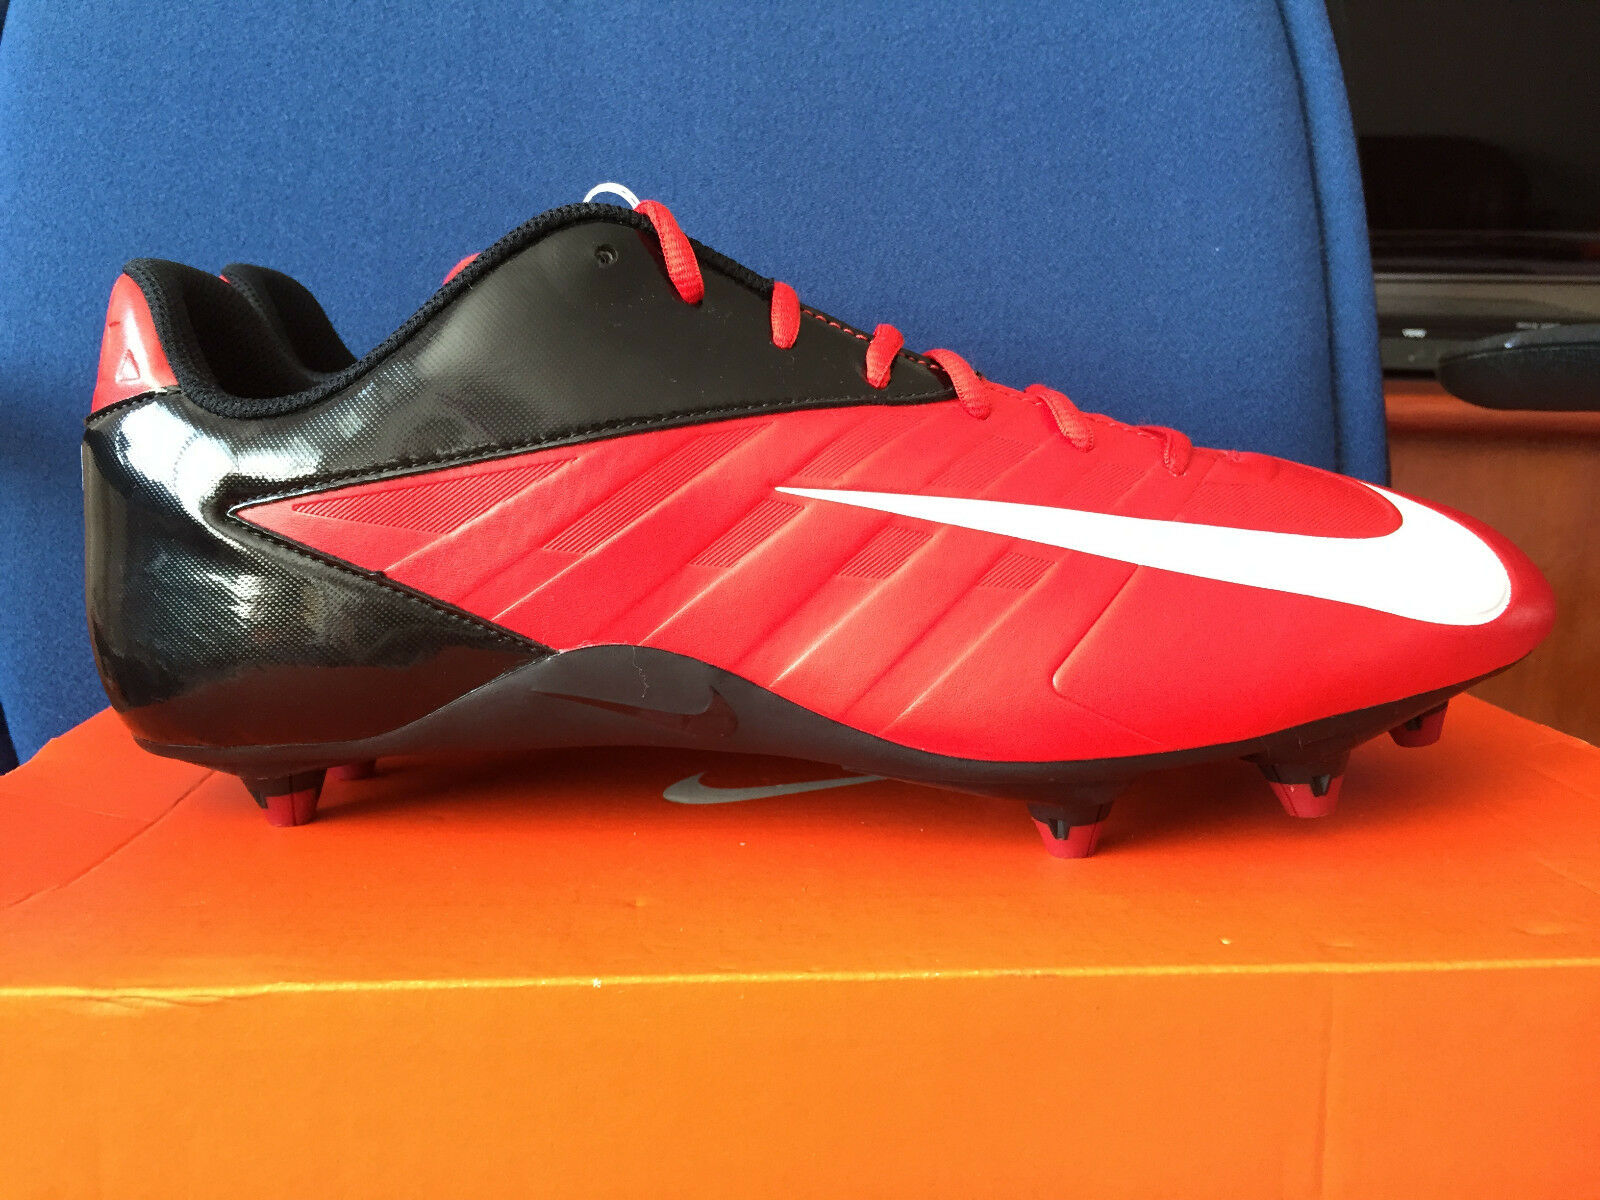 Mens Nike Vapor Strike D 3 Low, NFL Red Black Football Cleats 511336-610 Price reduction  Cheap women's shoes women's shoes